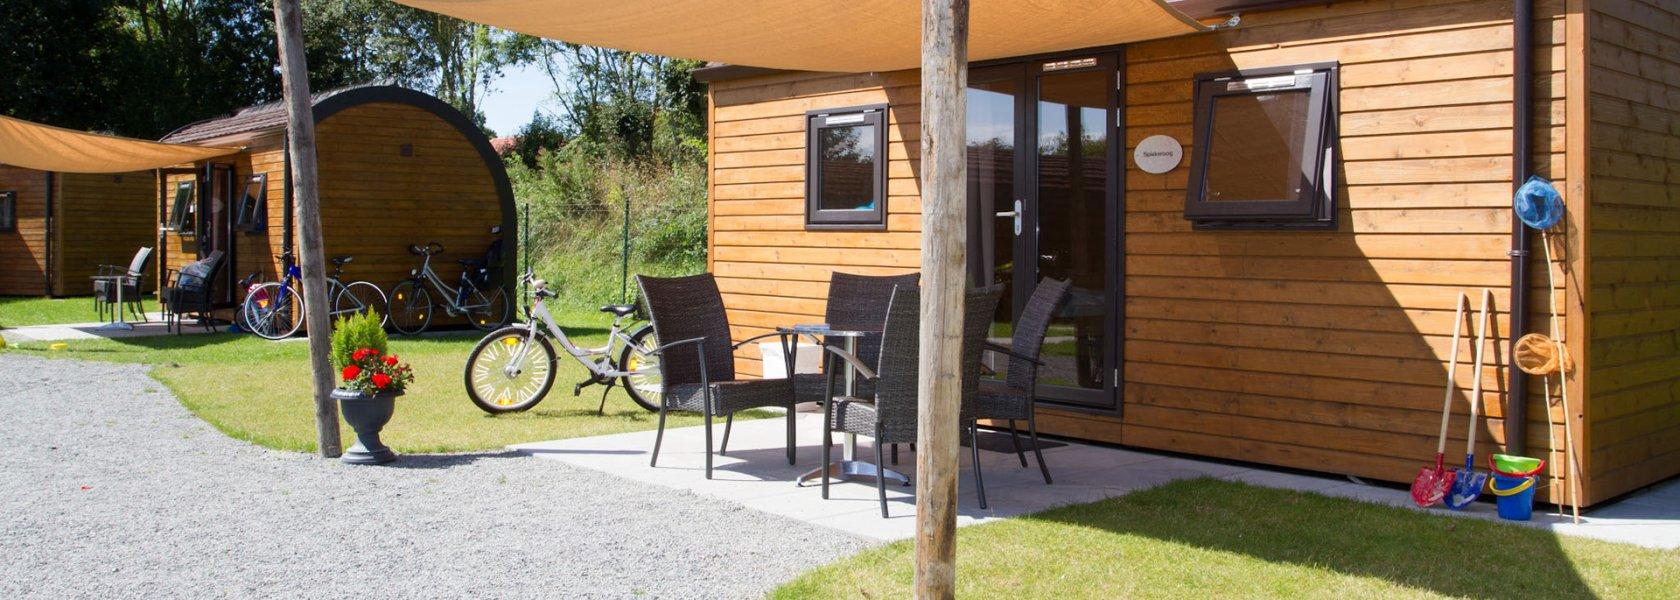 Nordsee-Wellen im Nordsee-Camp, © Nordsee-Camp Norddeich GmbH